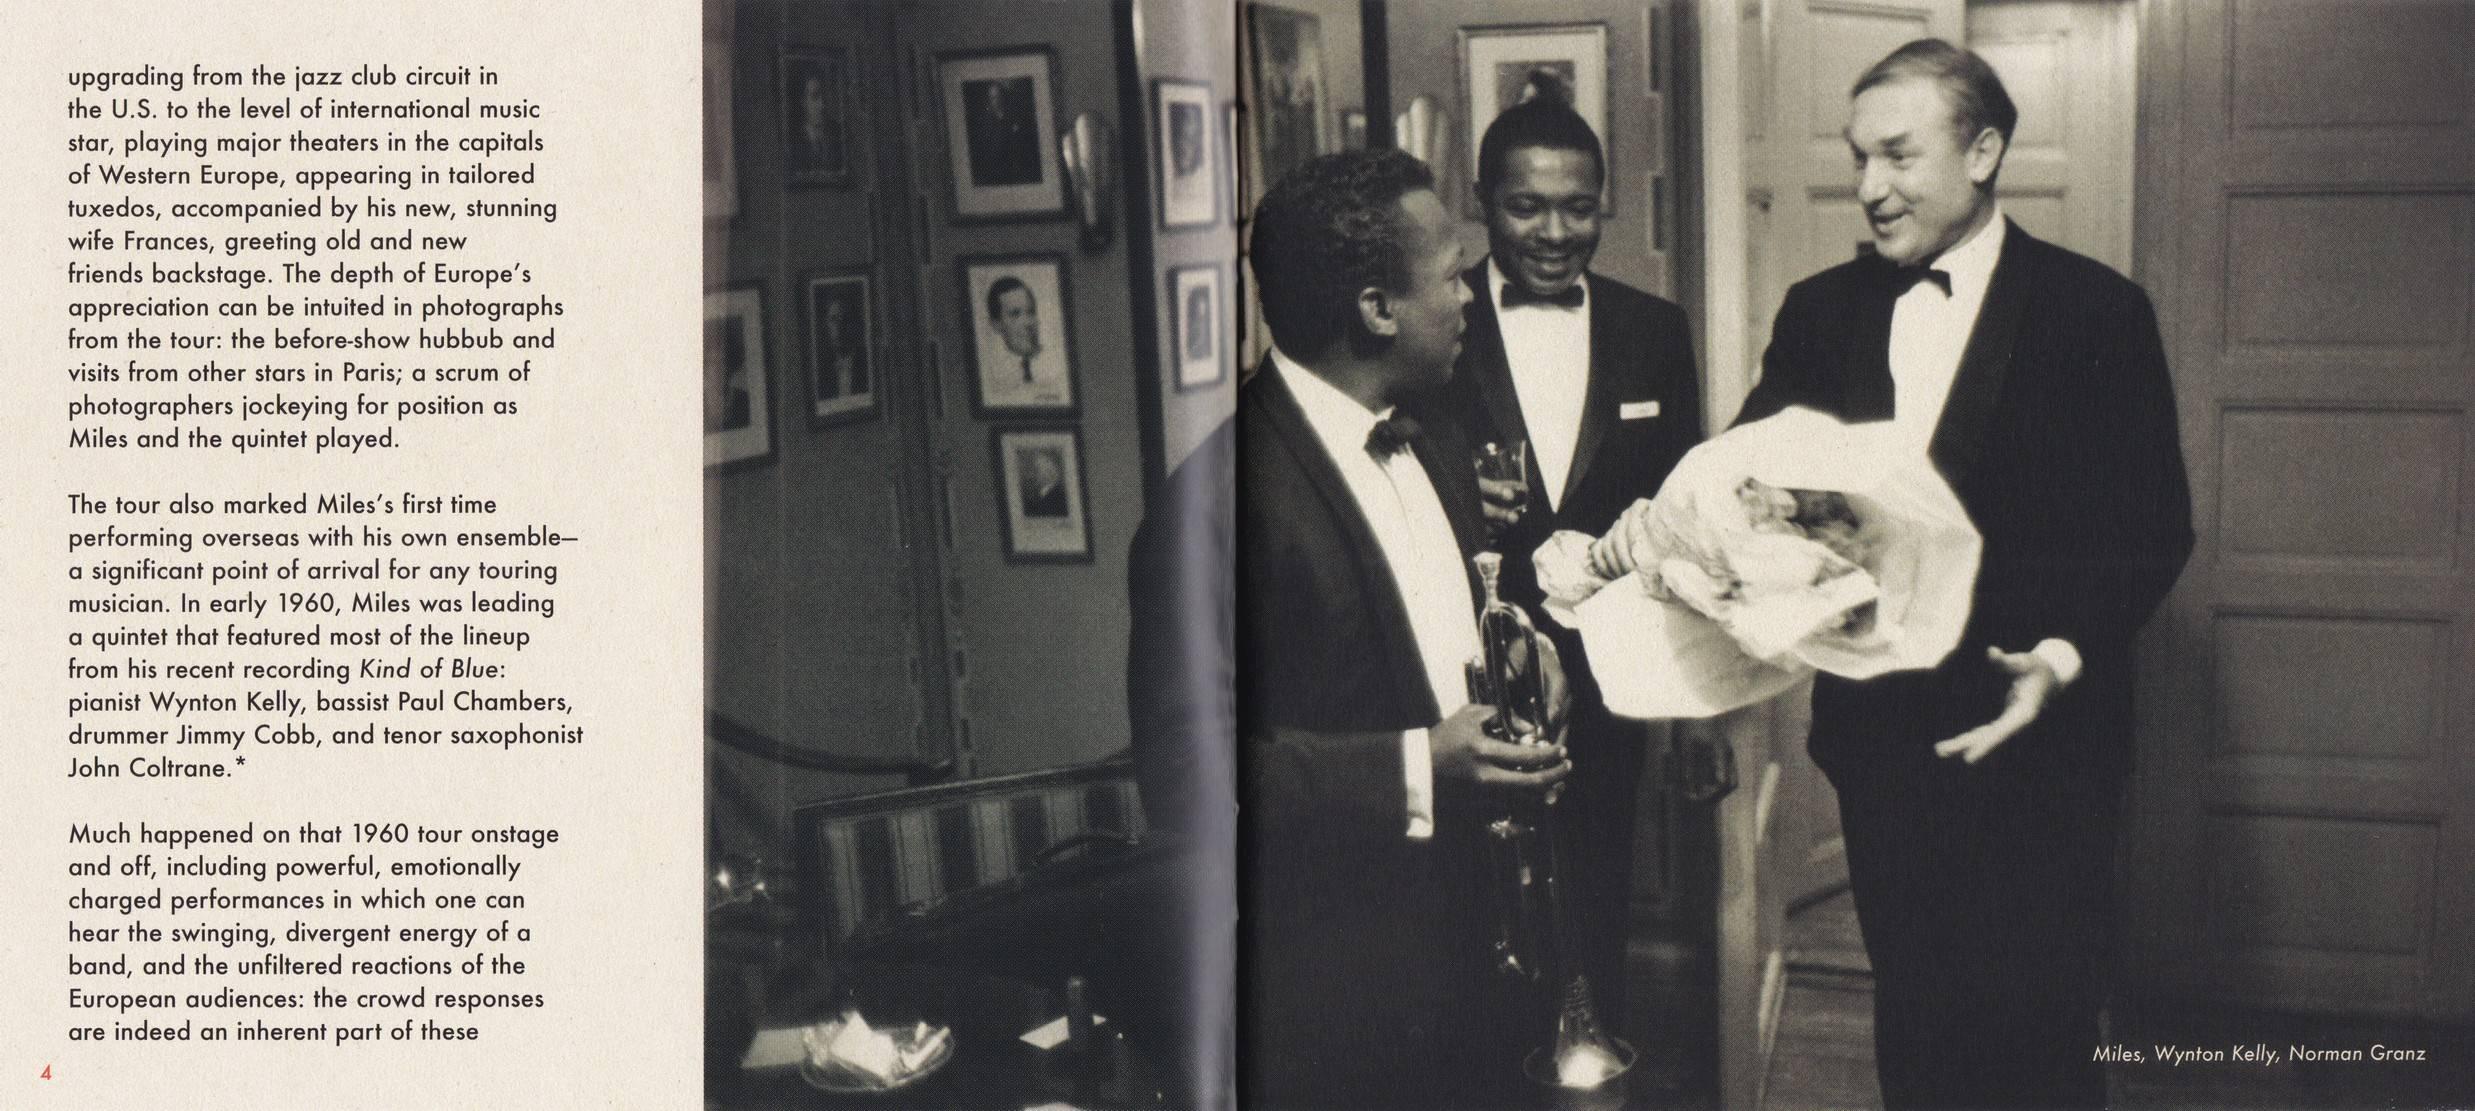 Miles Davis & John Coltrane - The Final Tour: The Bootleg Series, Vol. 6 (2018) {4CD Set Columbia 88985448392 rec 1960}